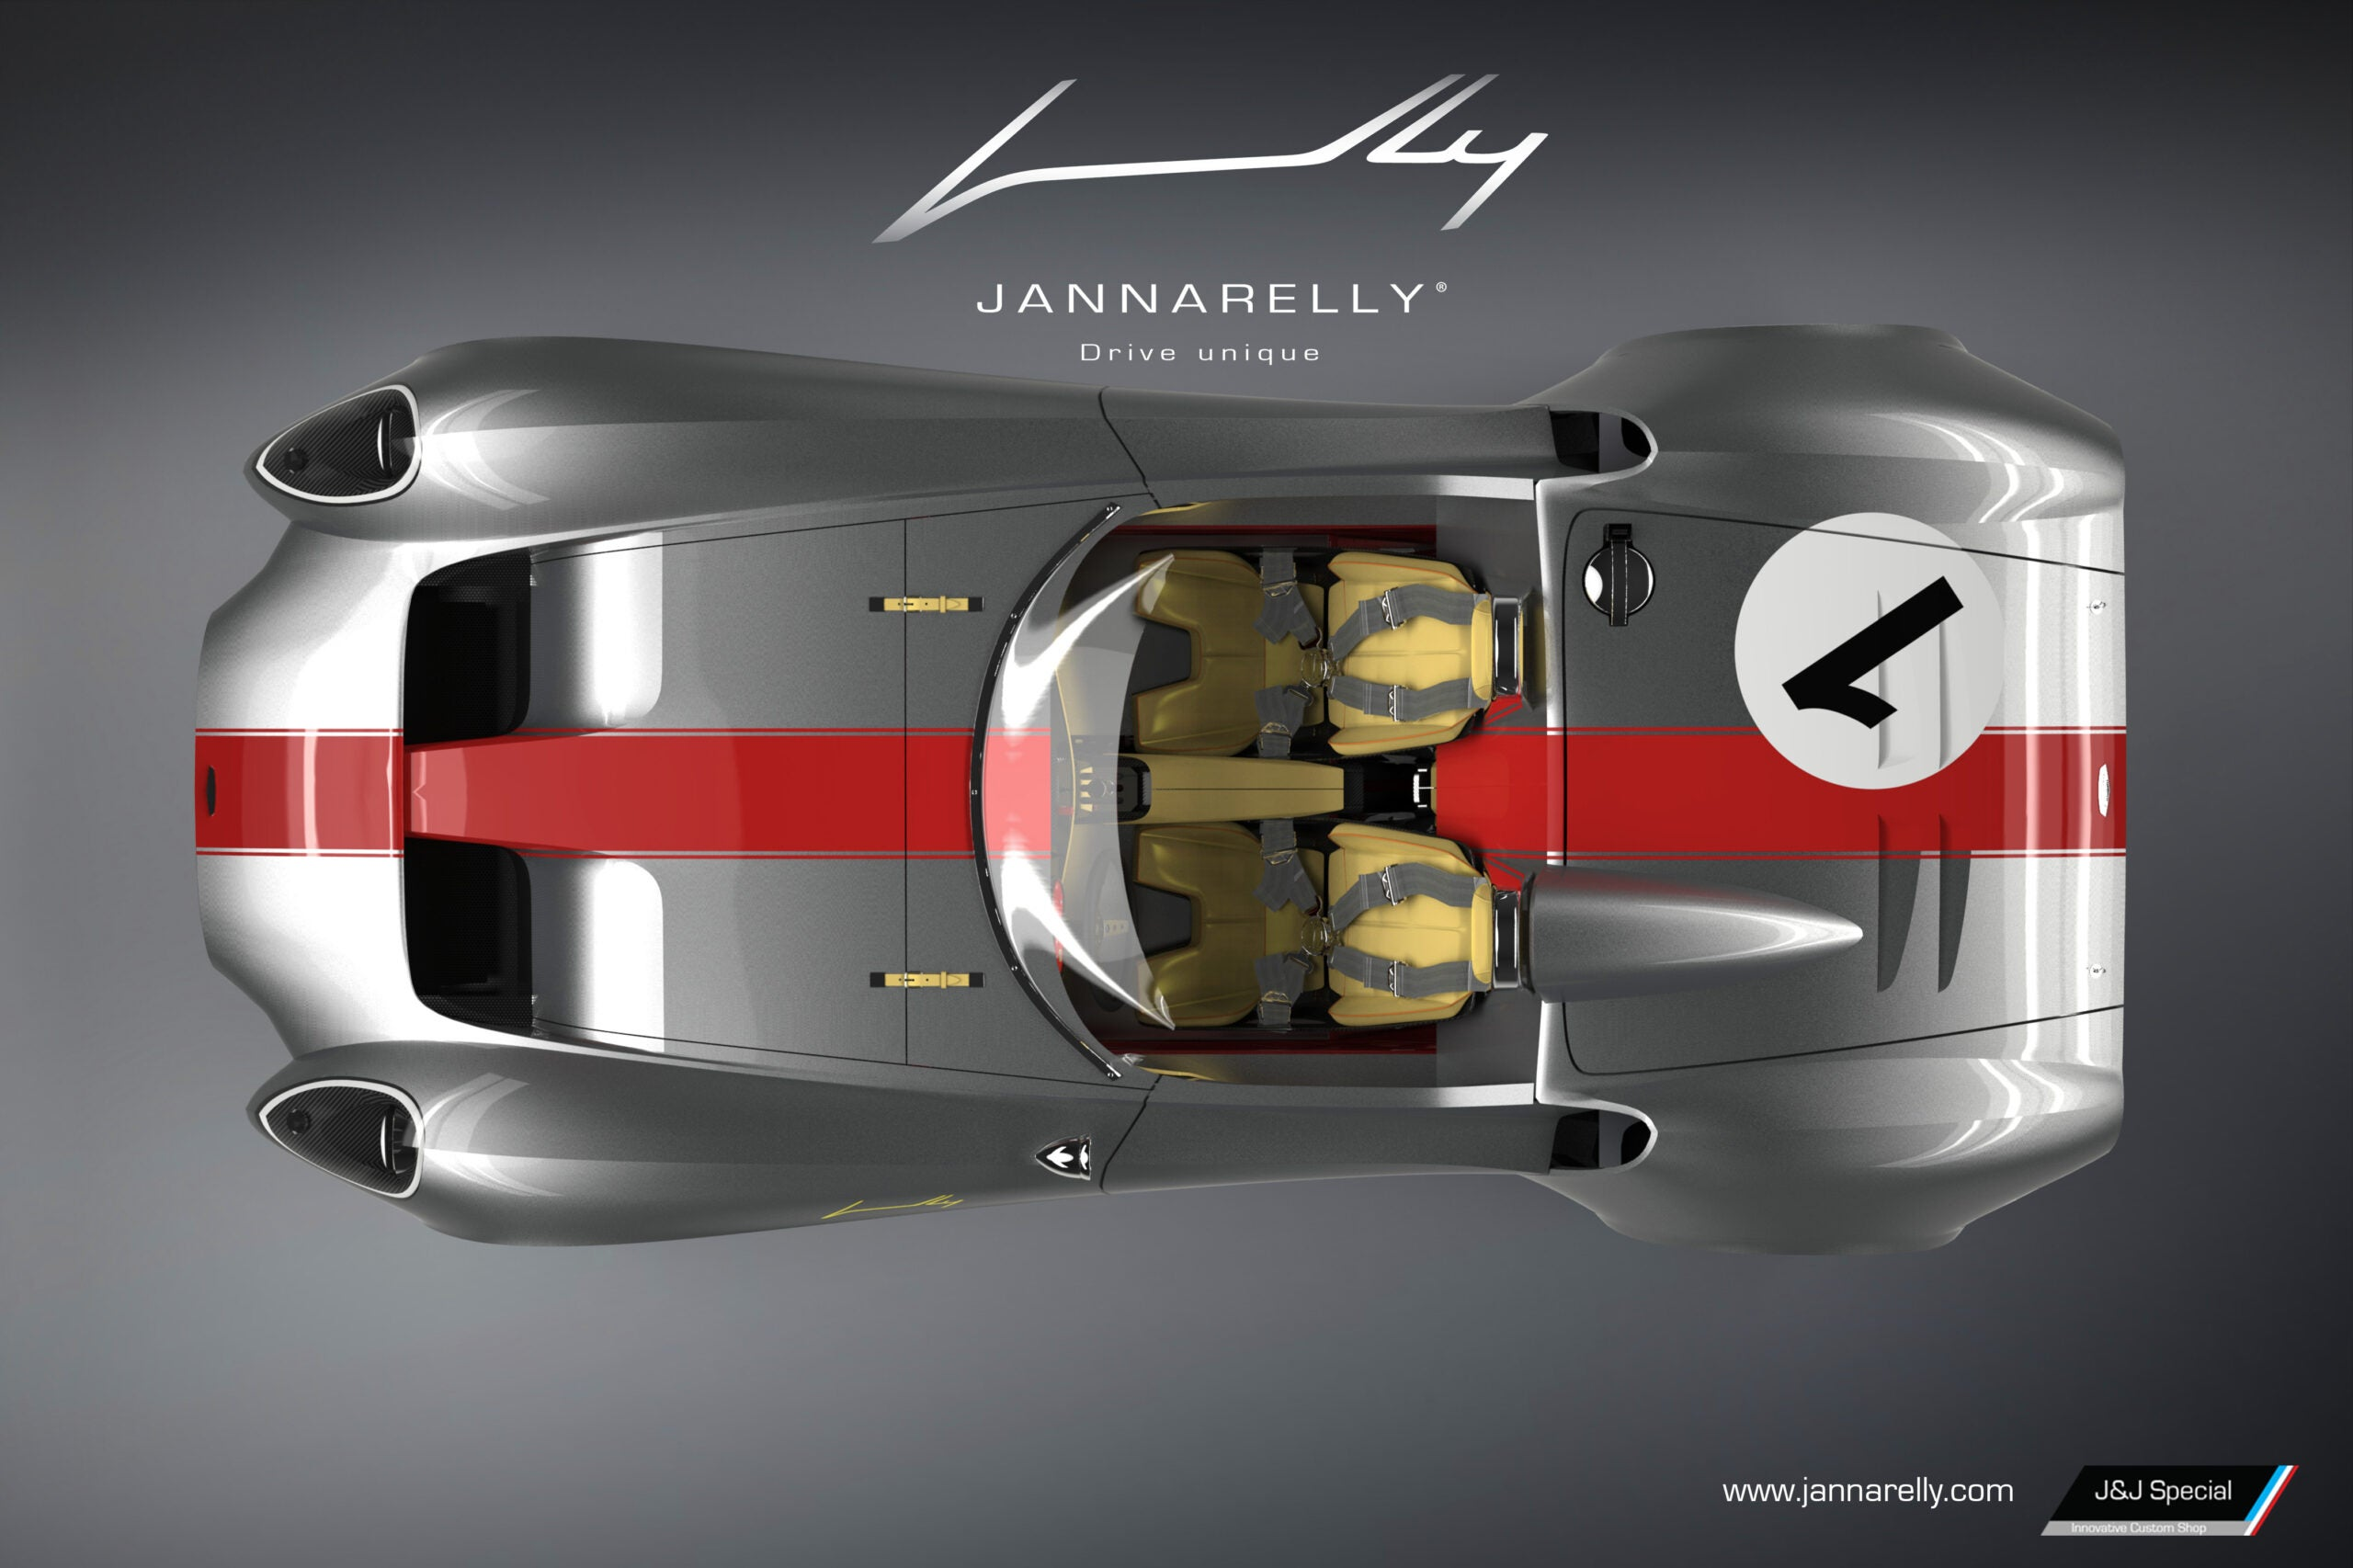 Jannarelly Builds a New Car Company on Old-Car Style